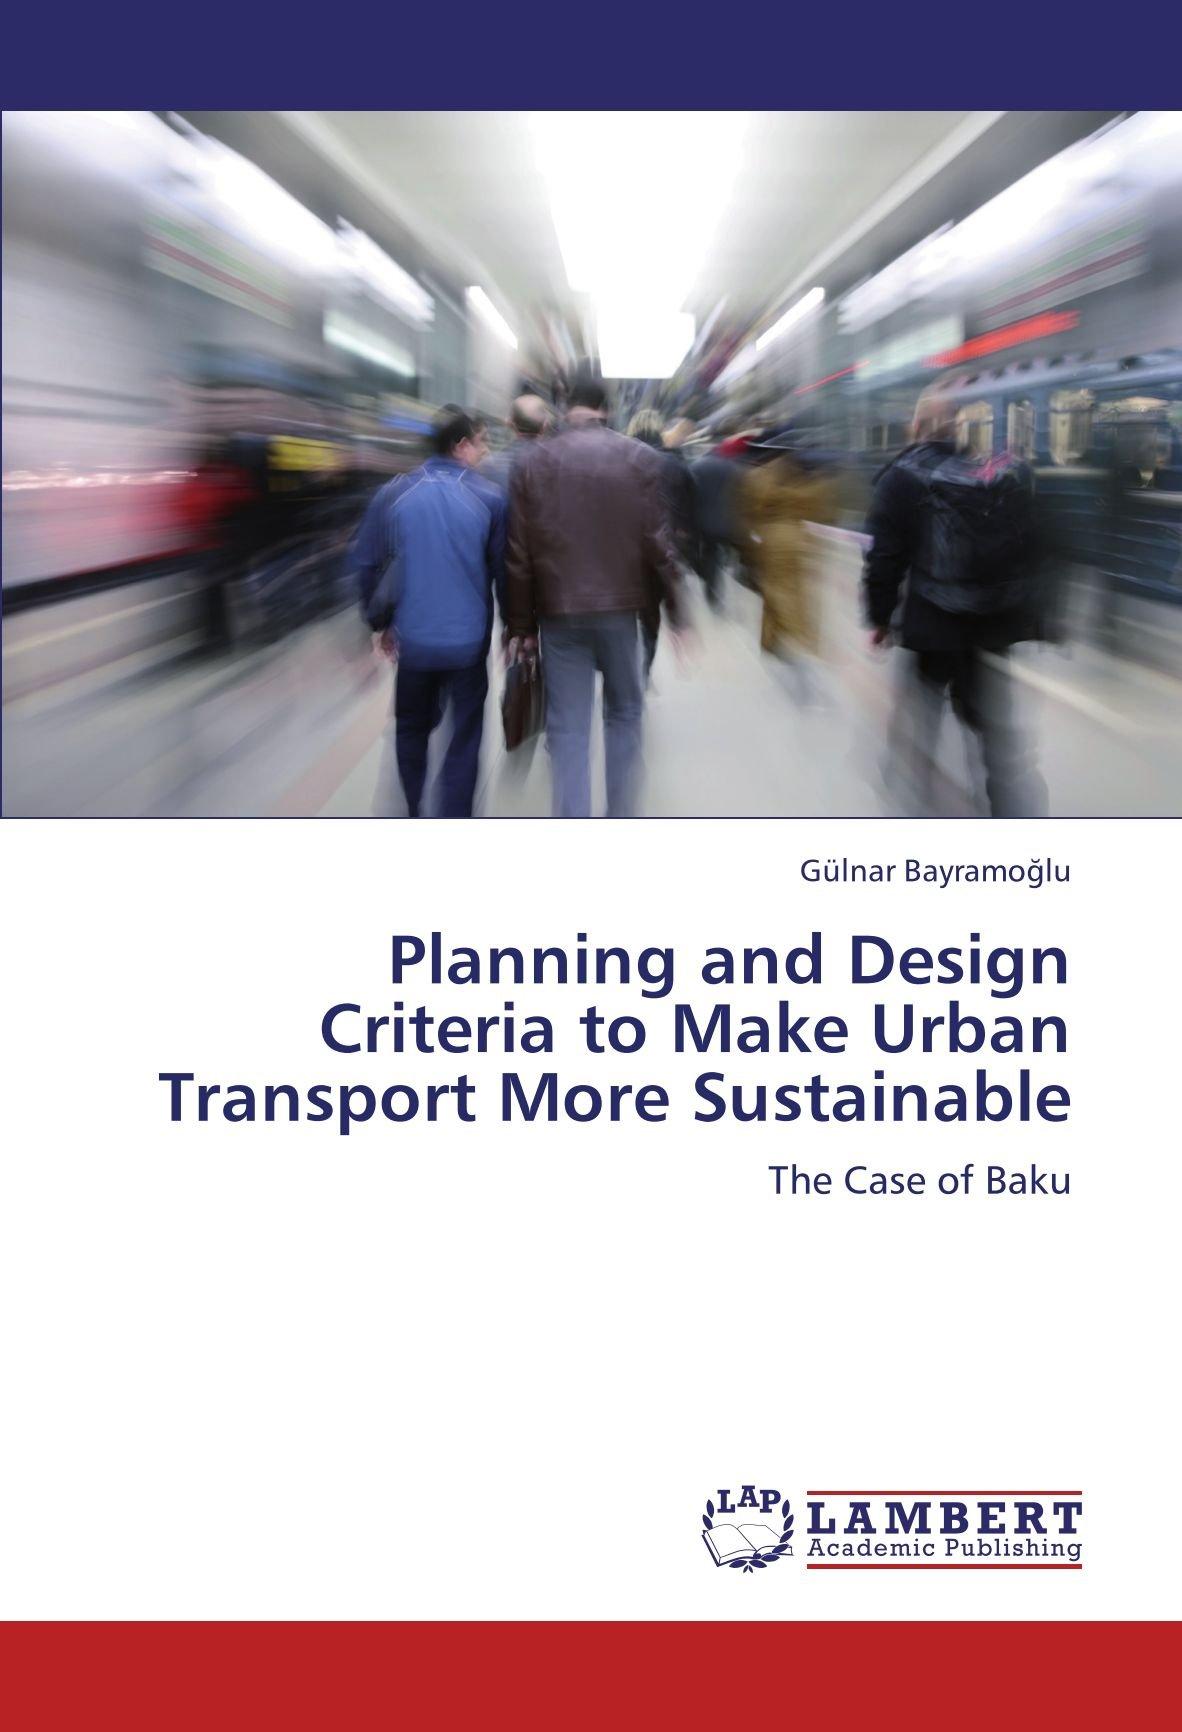 Planning and Design Criteria to Make Urban Transport More Sustainable: The  Case of Baku: Gülnar Bayramoğlu: 9783847342502: Amazon.com: Books